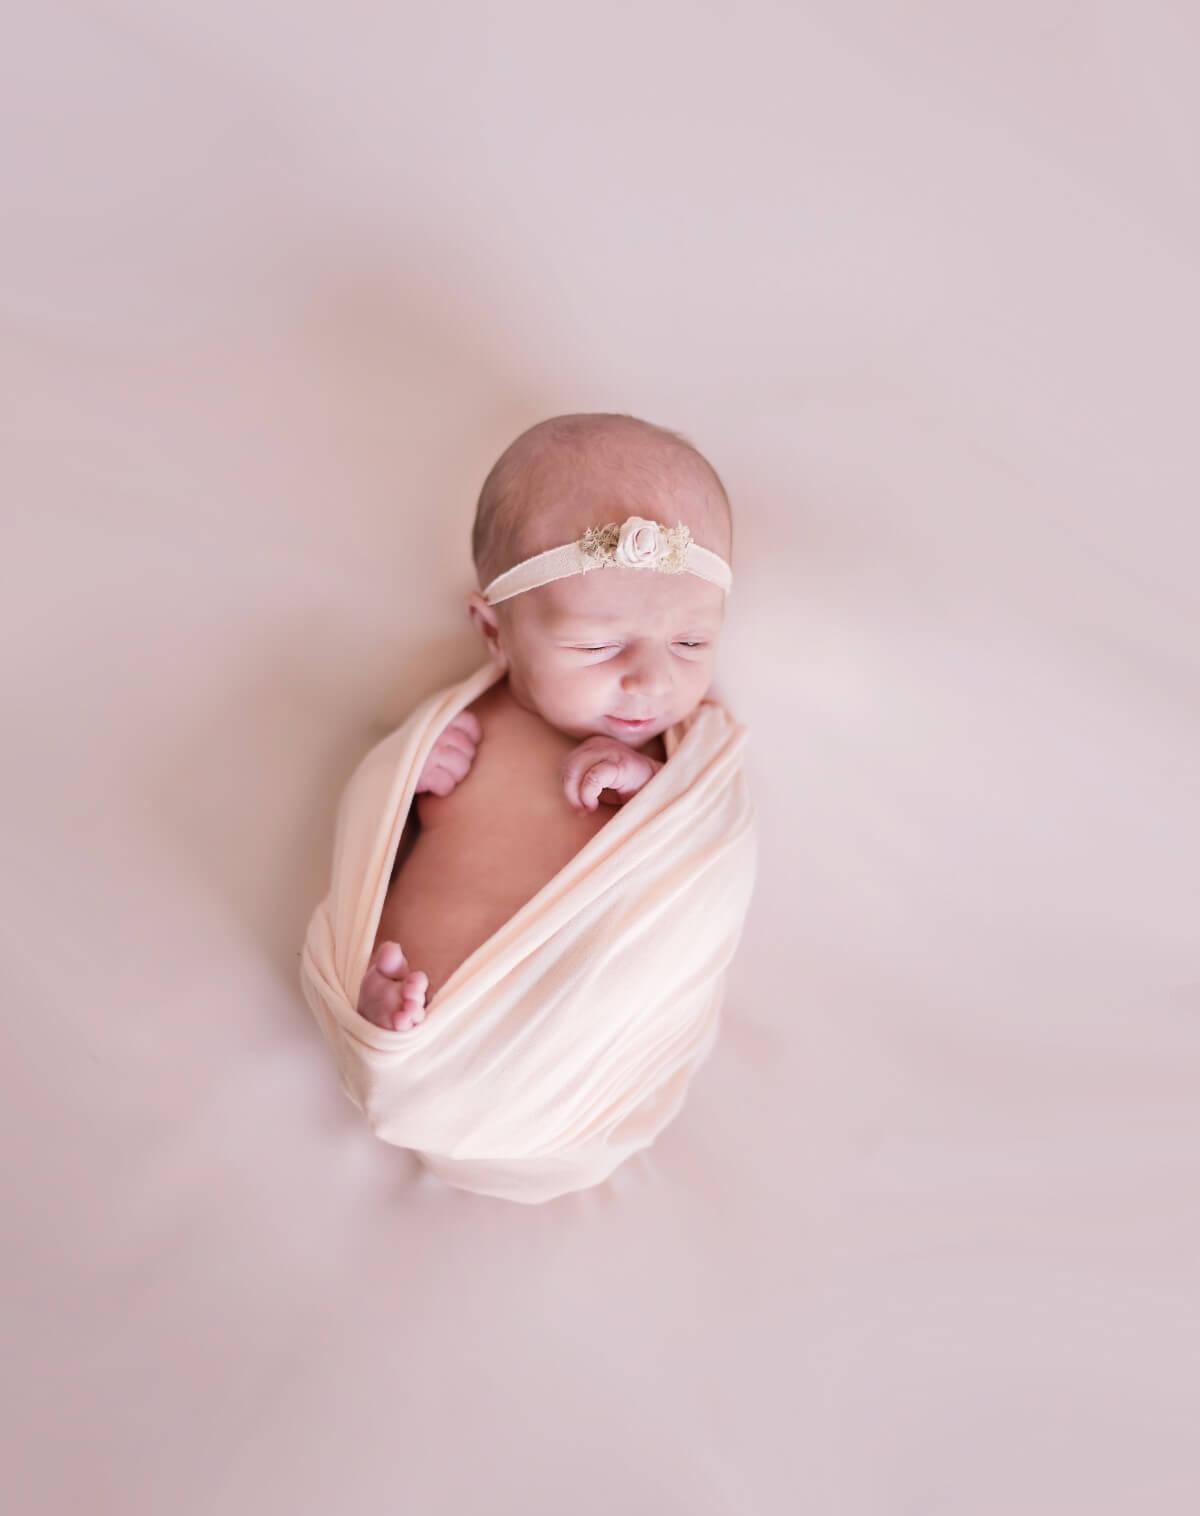 Just Born Newborn New Born Baby child girl boy freelance Photographer for babies kids edenvale johannesburg gauteng south africa 15